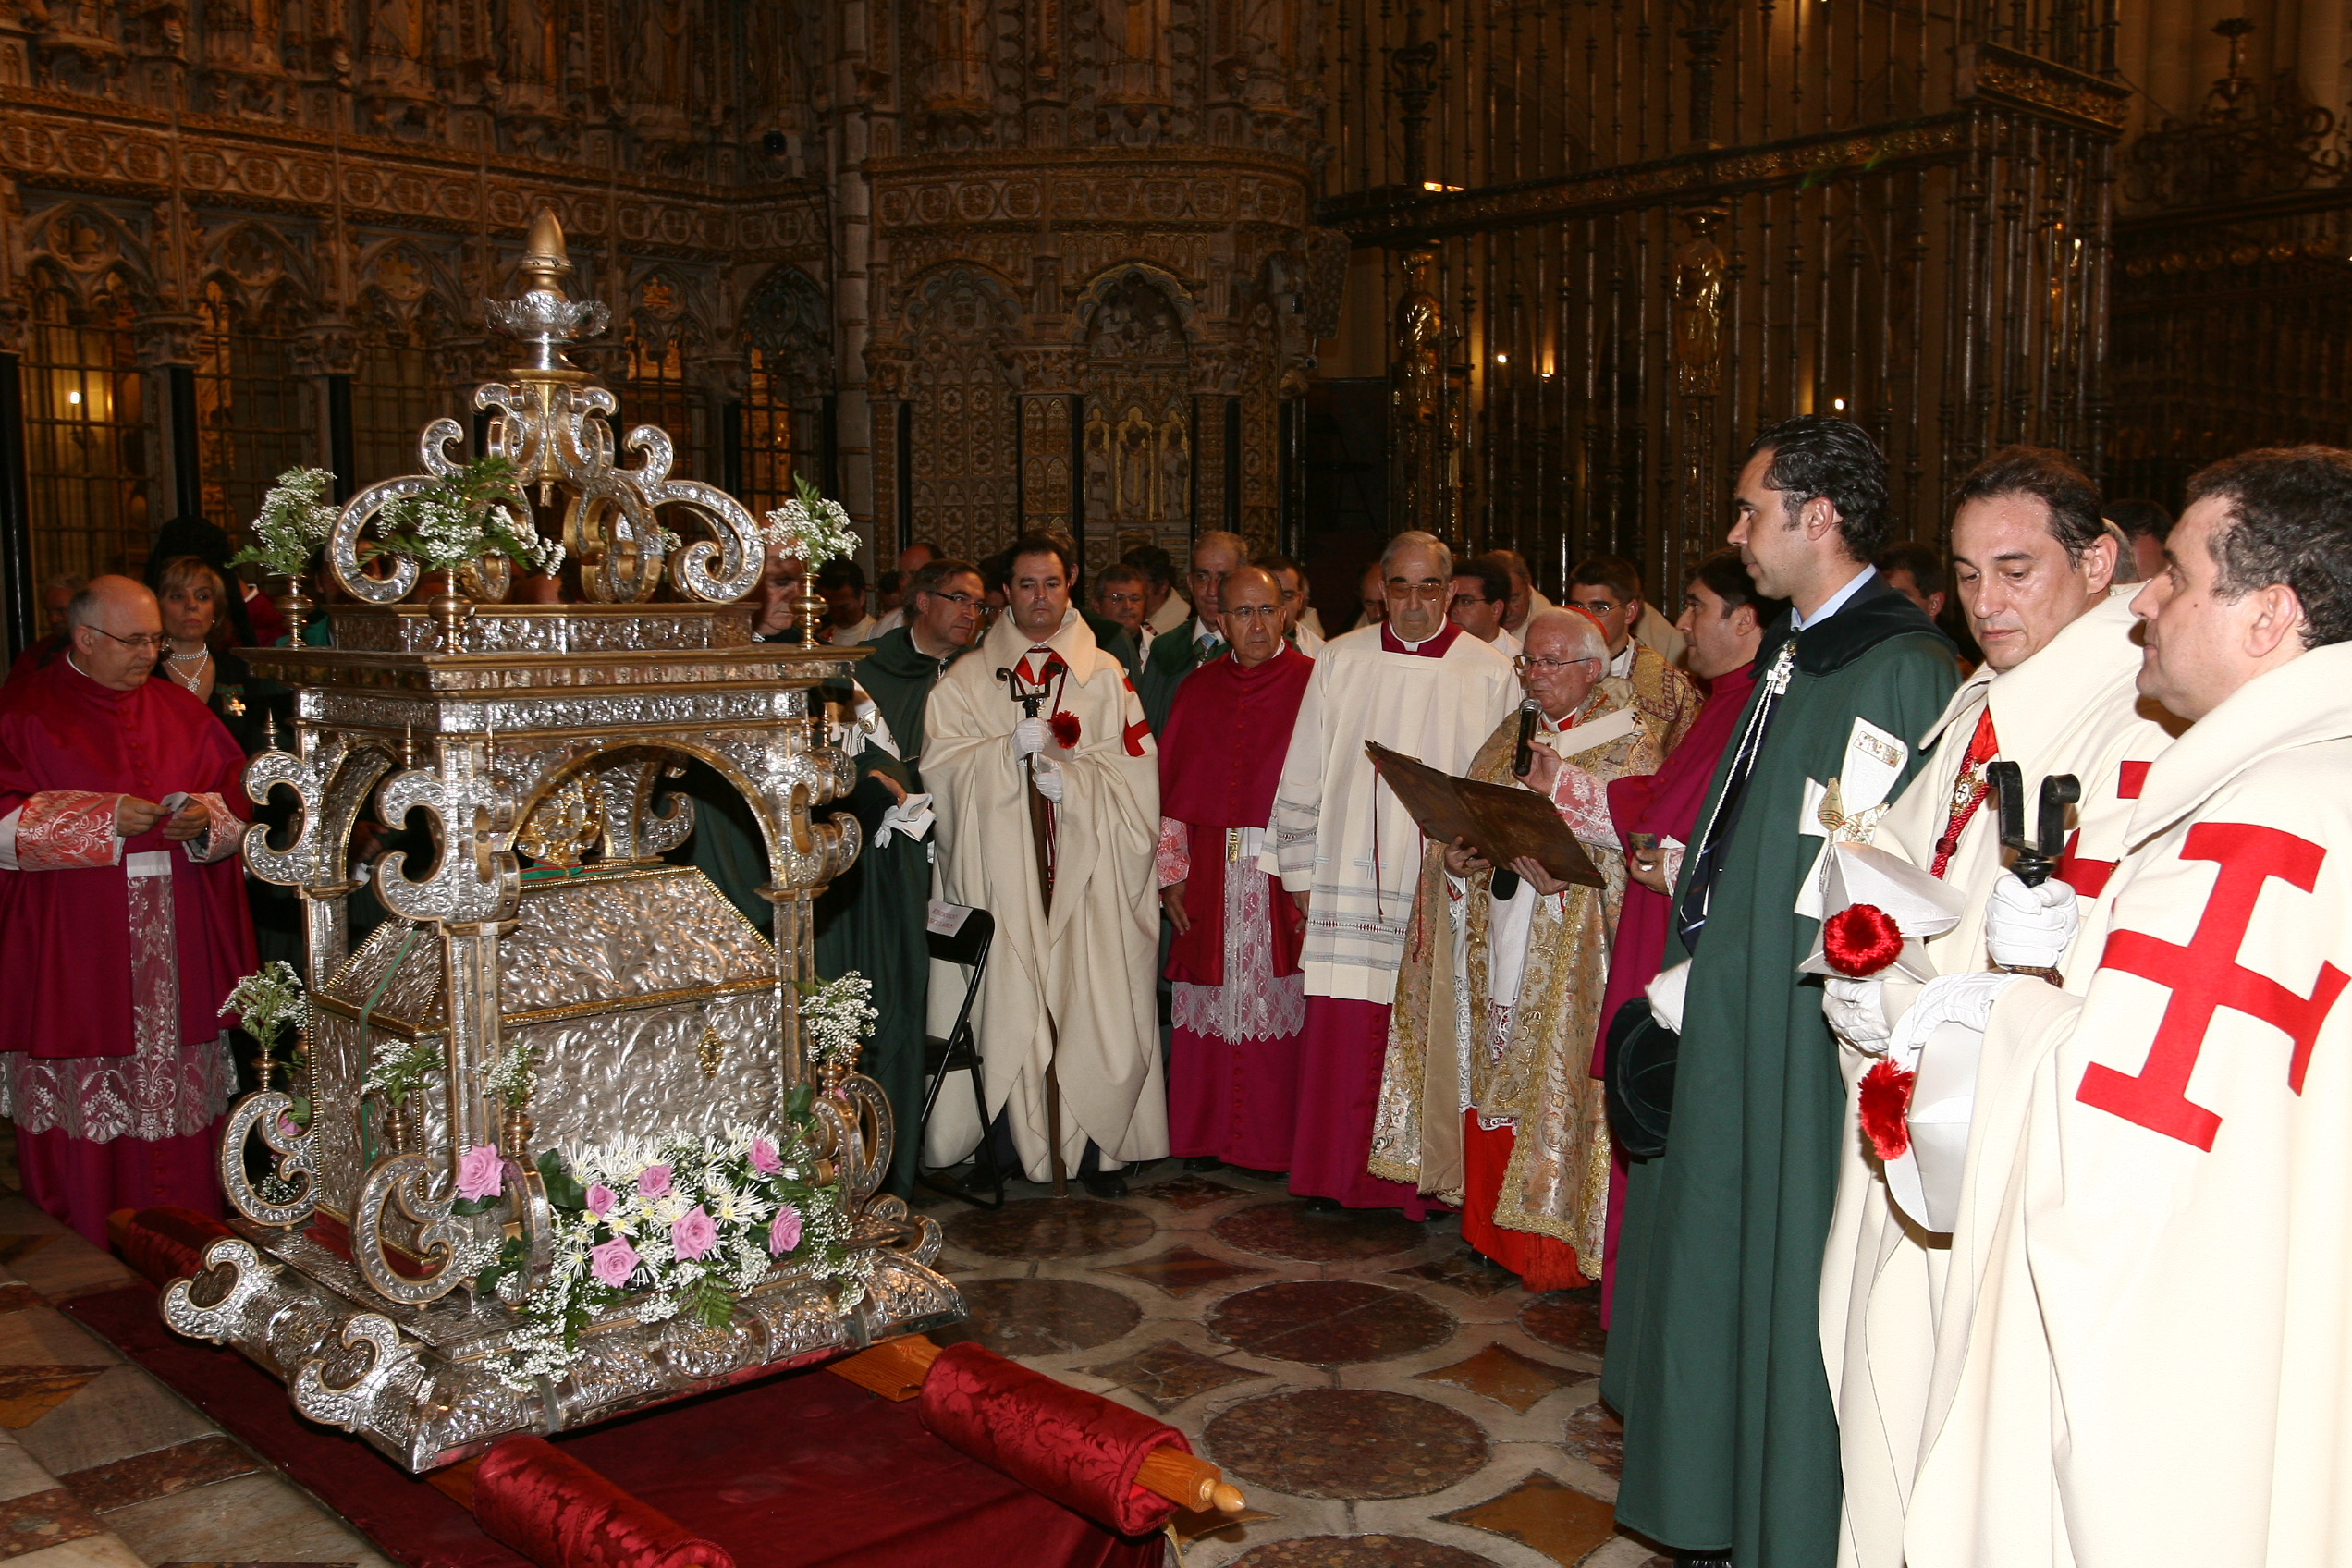 Reliquias S. Ildefonso 3